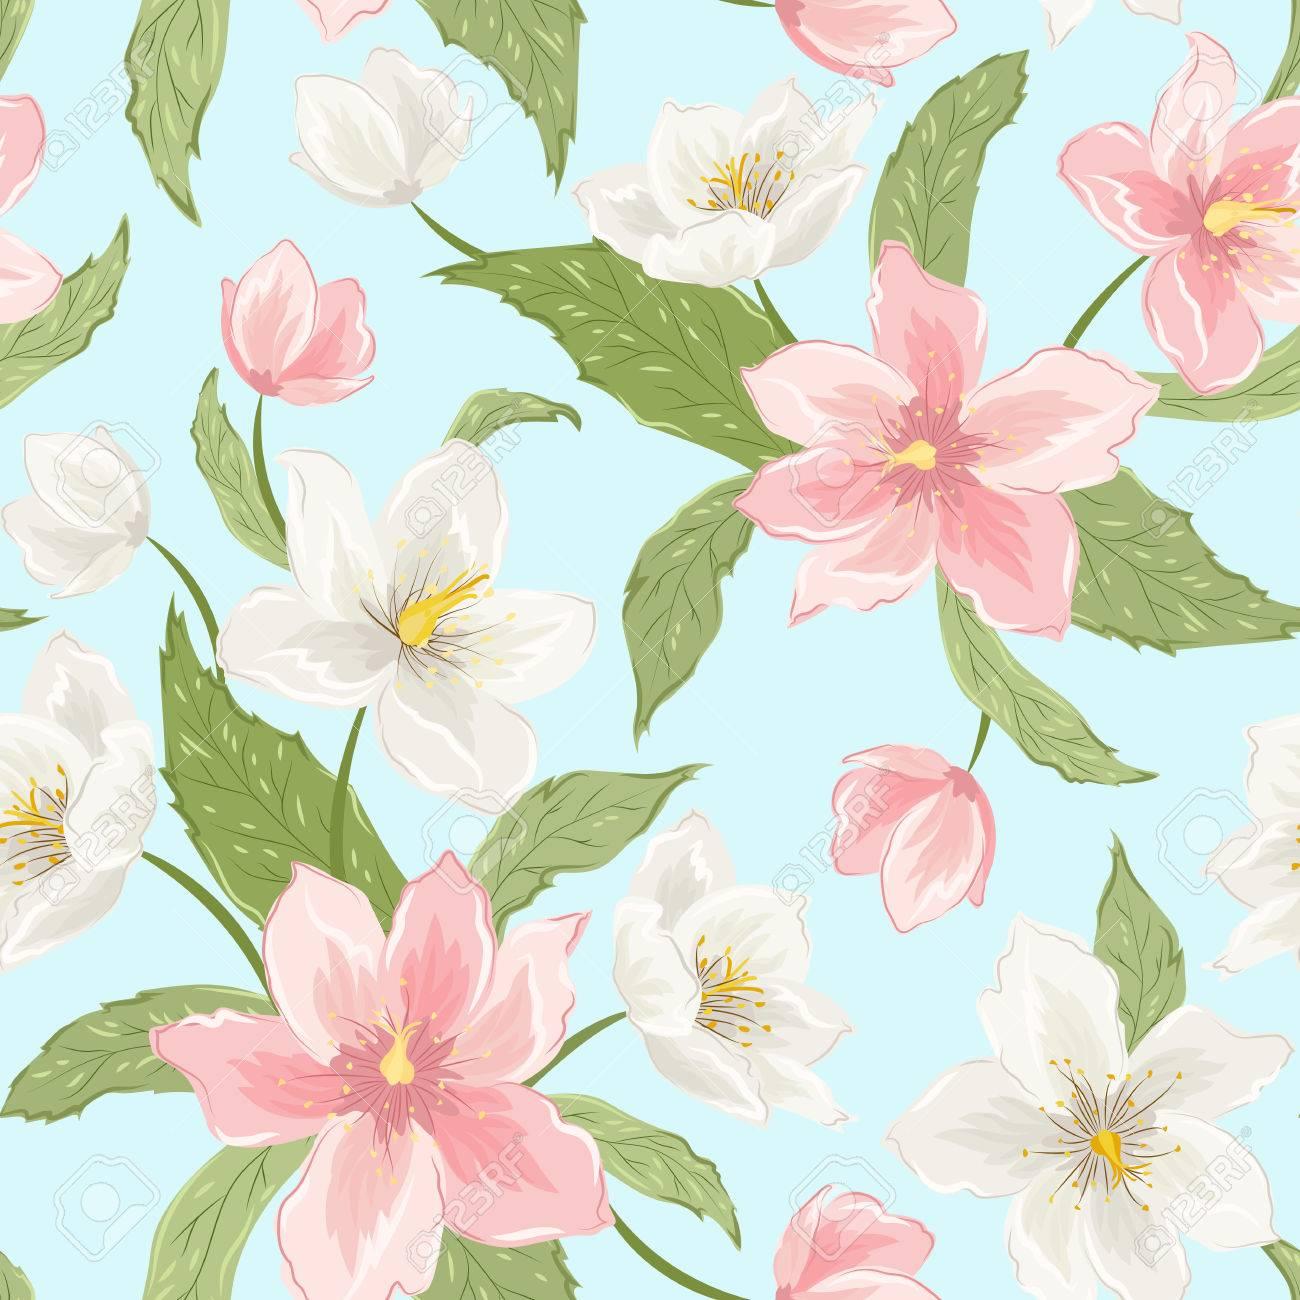 Magnolia Sakura Hellebore Fleurs Seamless Pattern Hiver Rose De